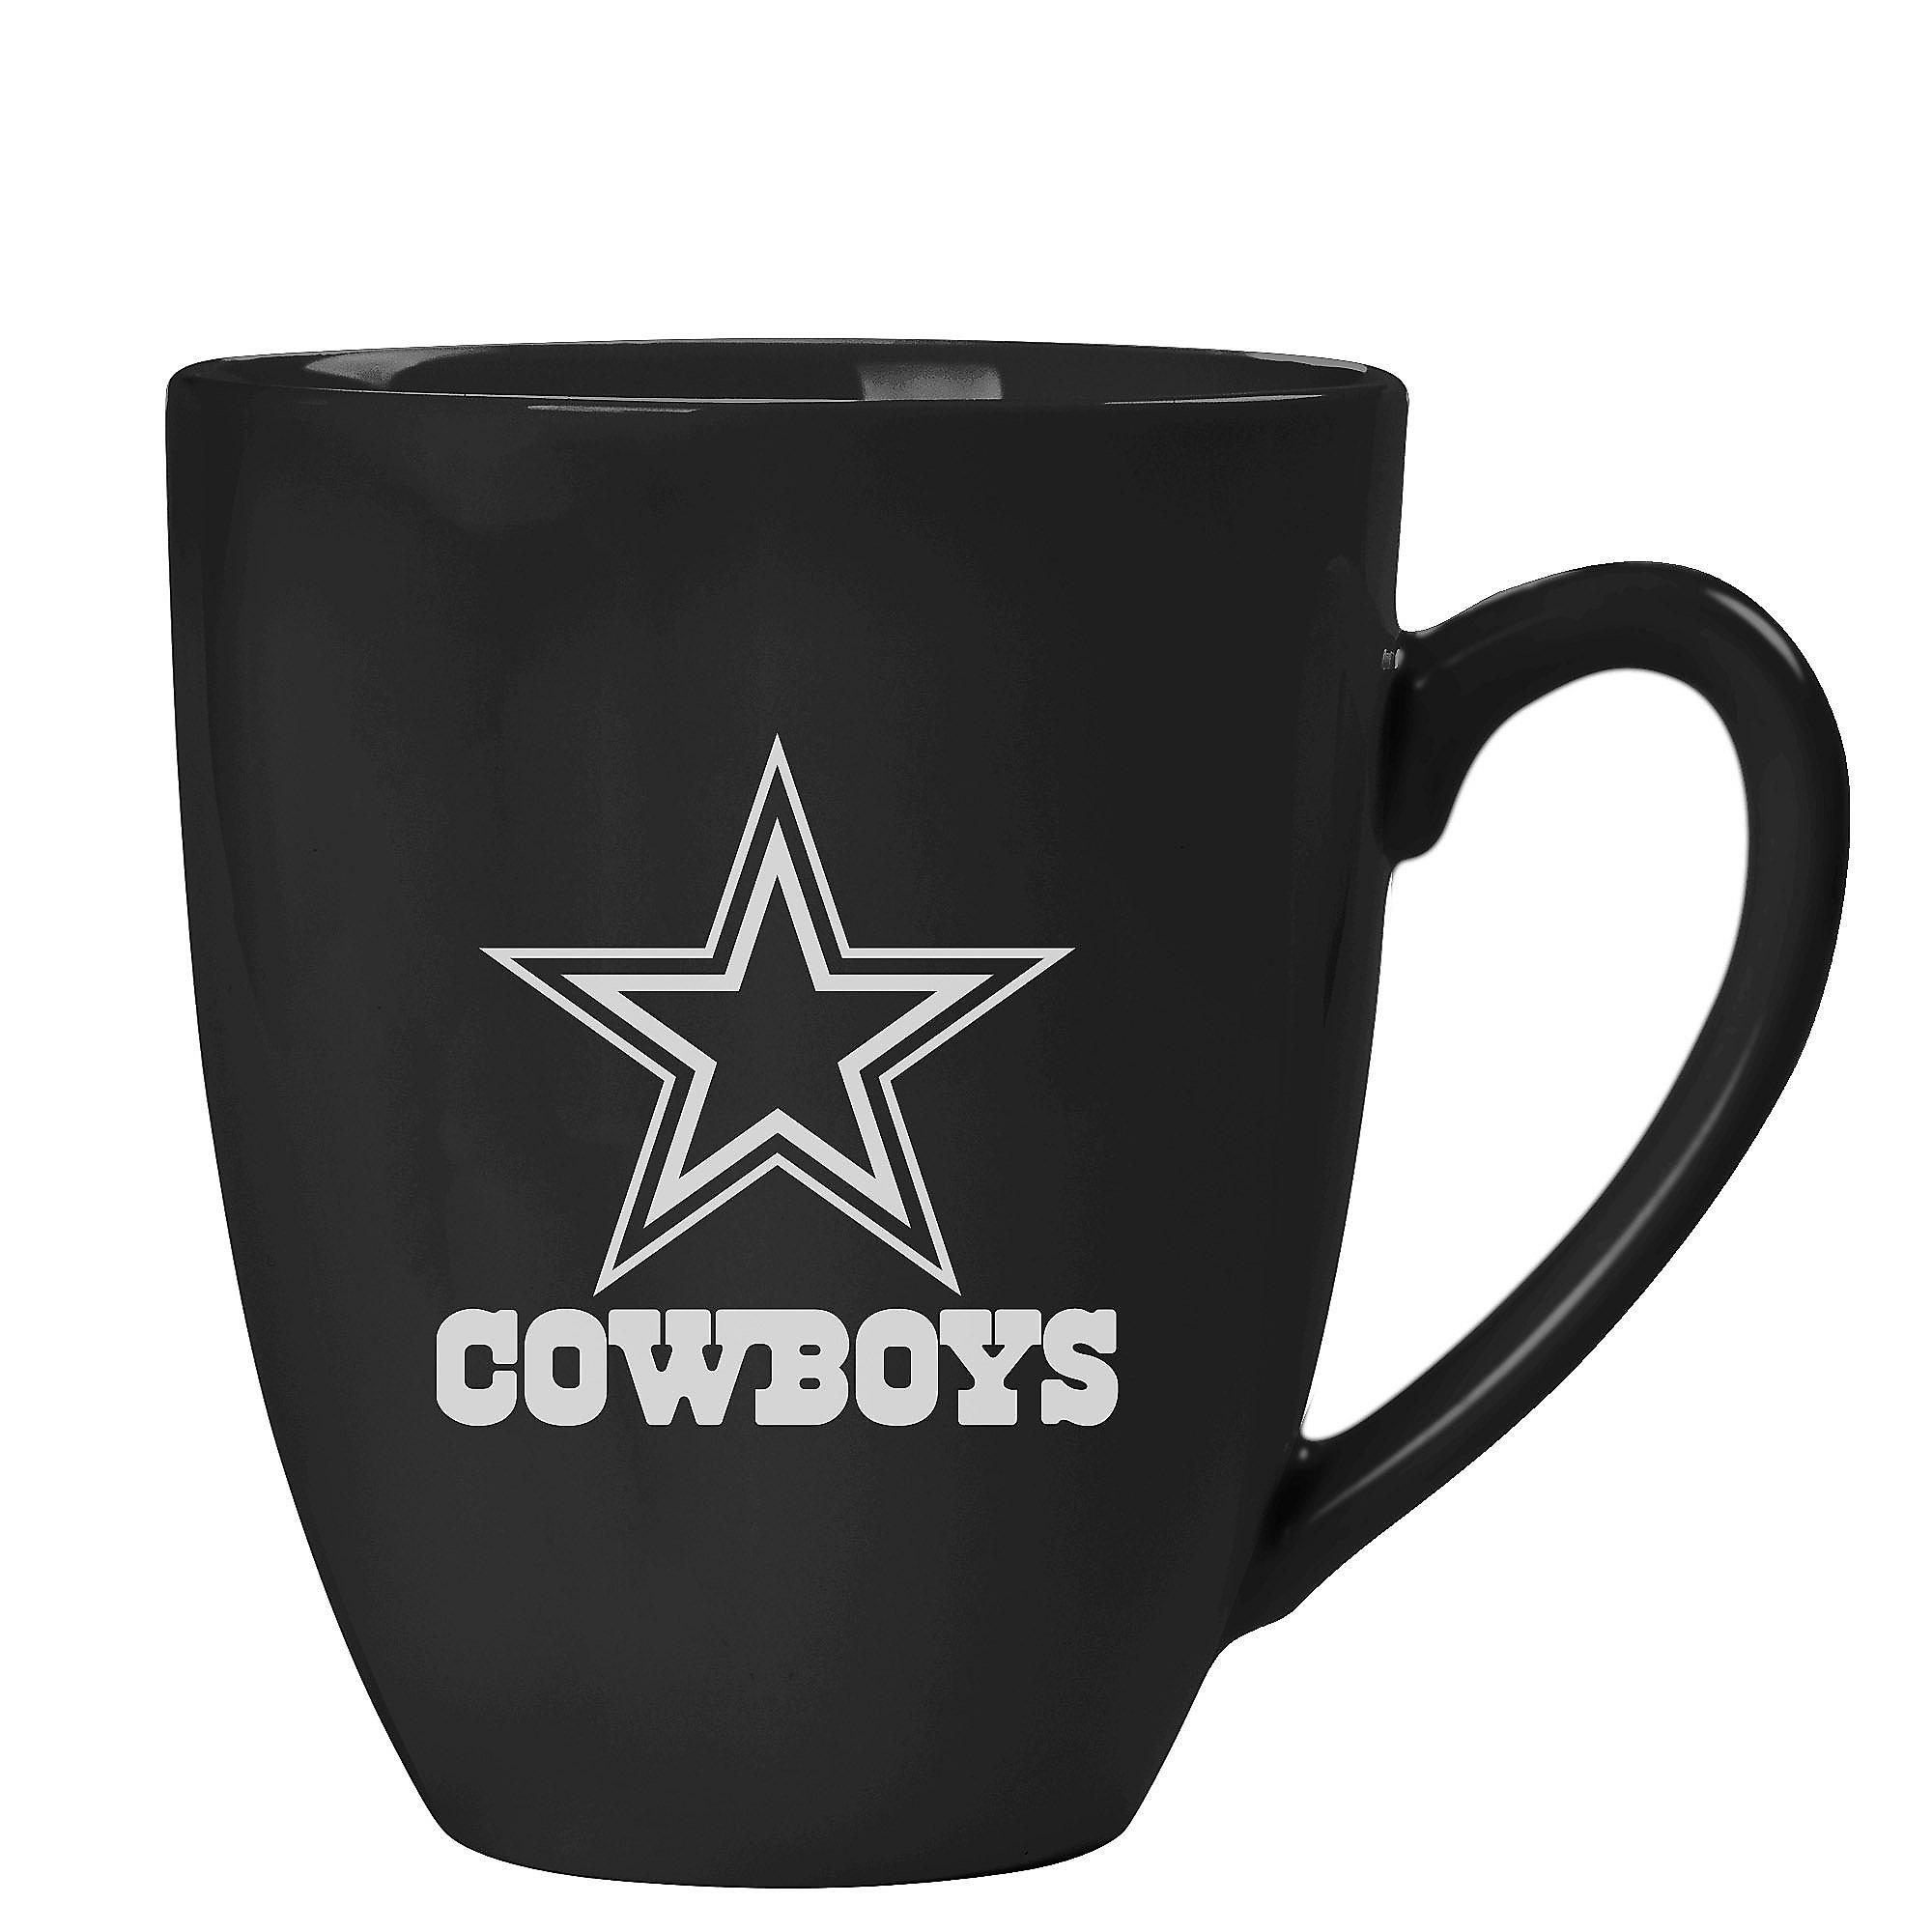 Dallas Cowboys 15 oz Black Ceramic Bistro Mug